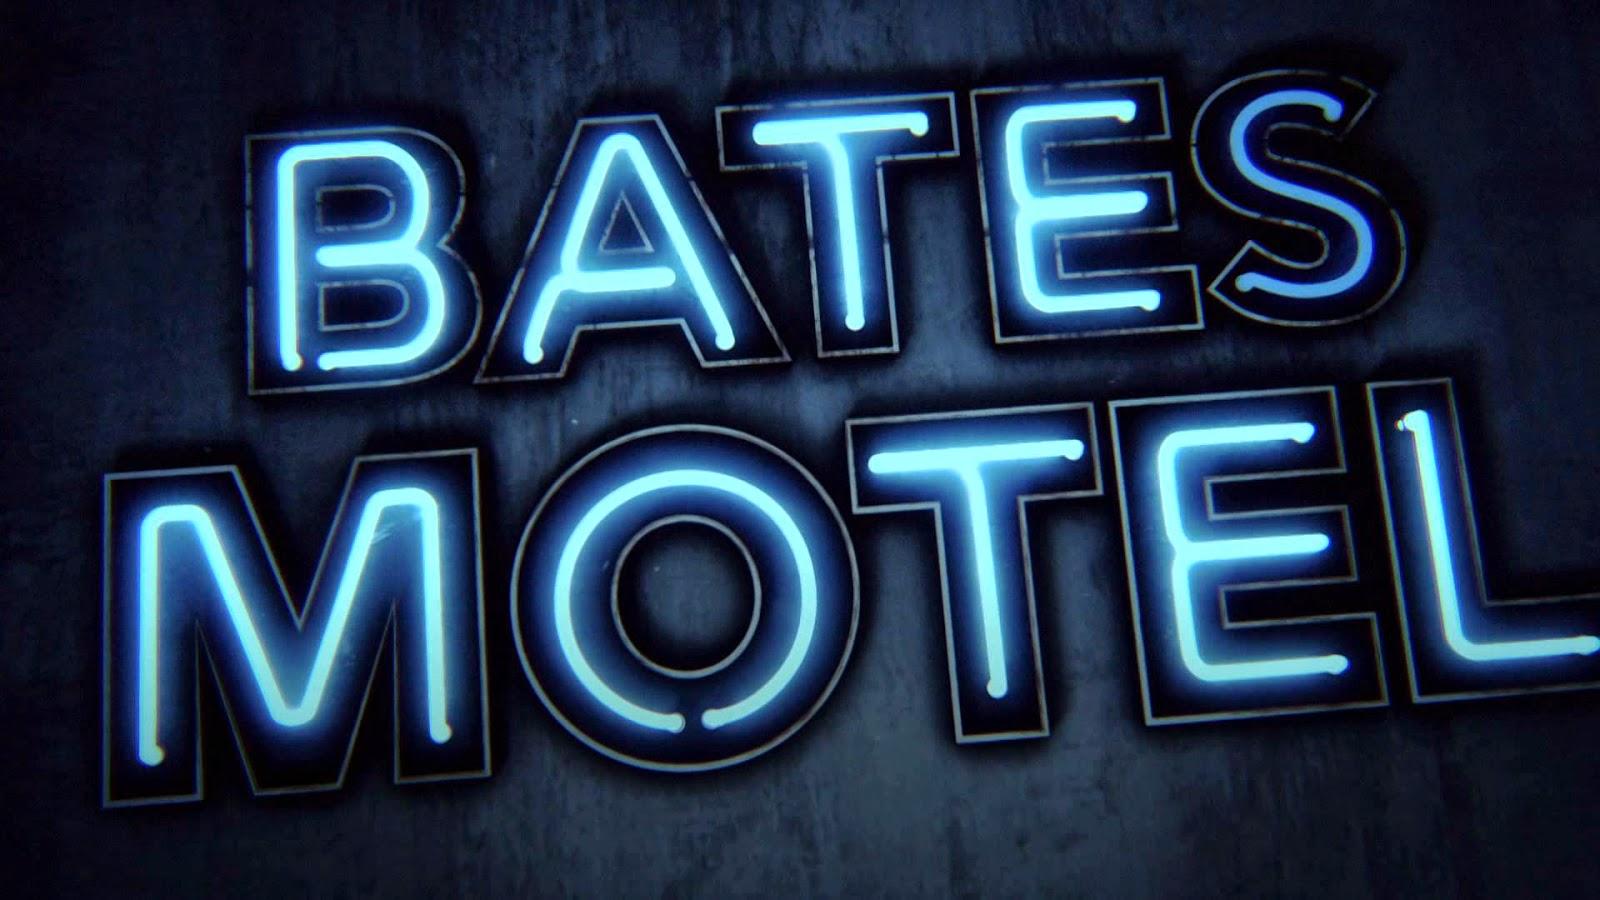 Bates Motel - Season 2 - A look back and review